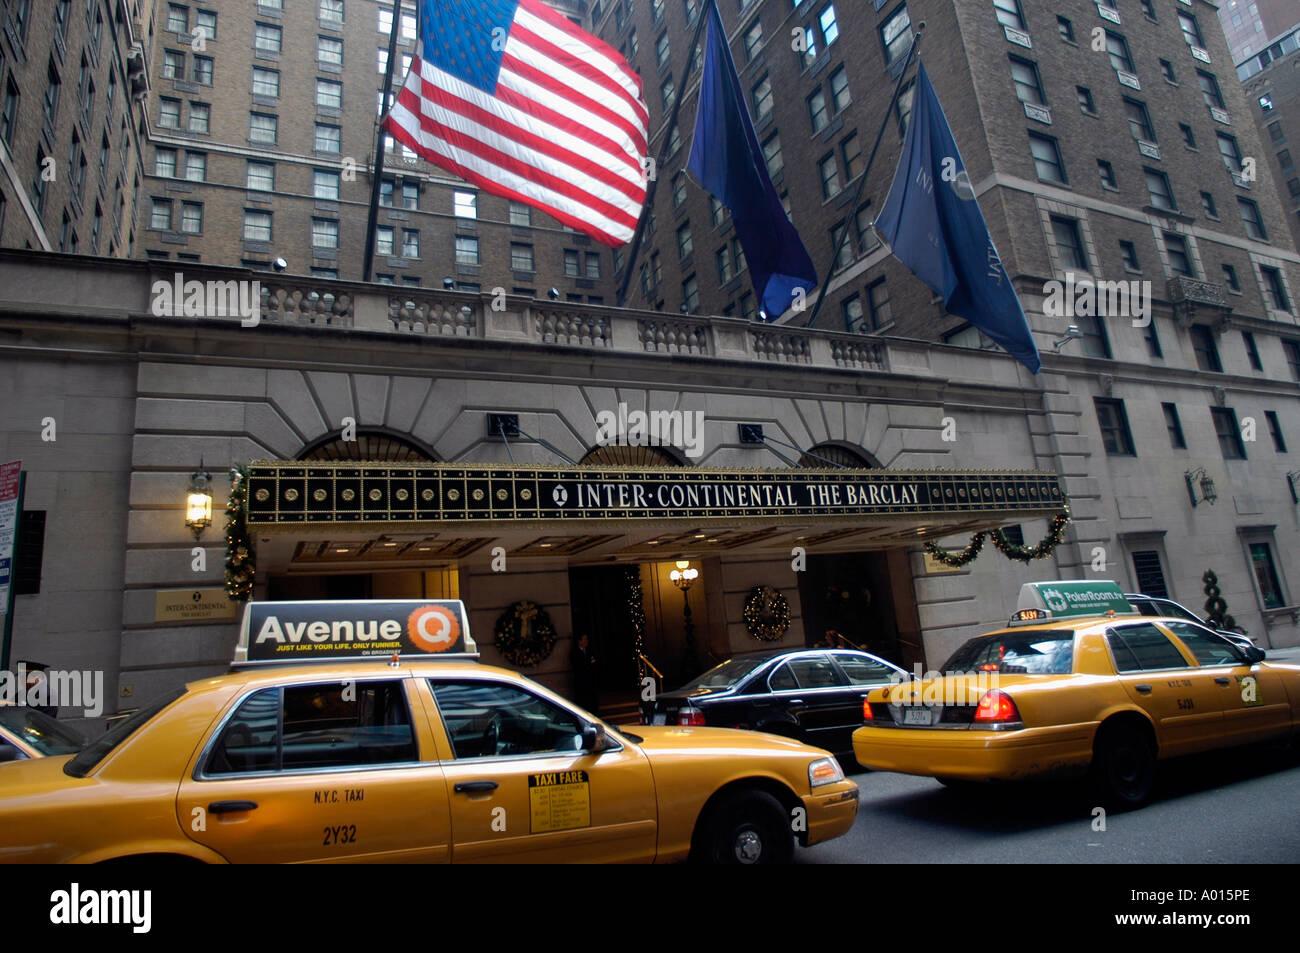 Barclay Intercontinental Hotel In New York City Stock Photo Alamy